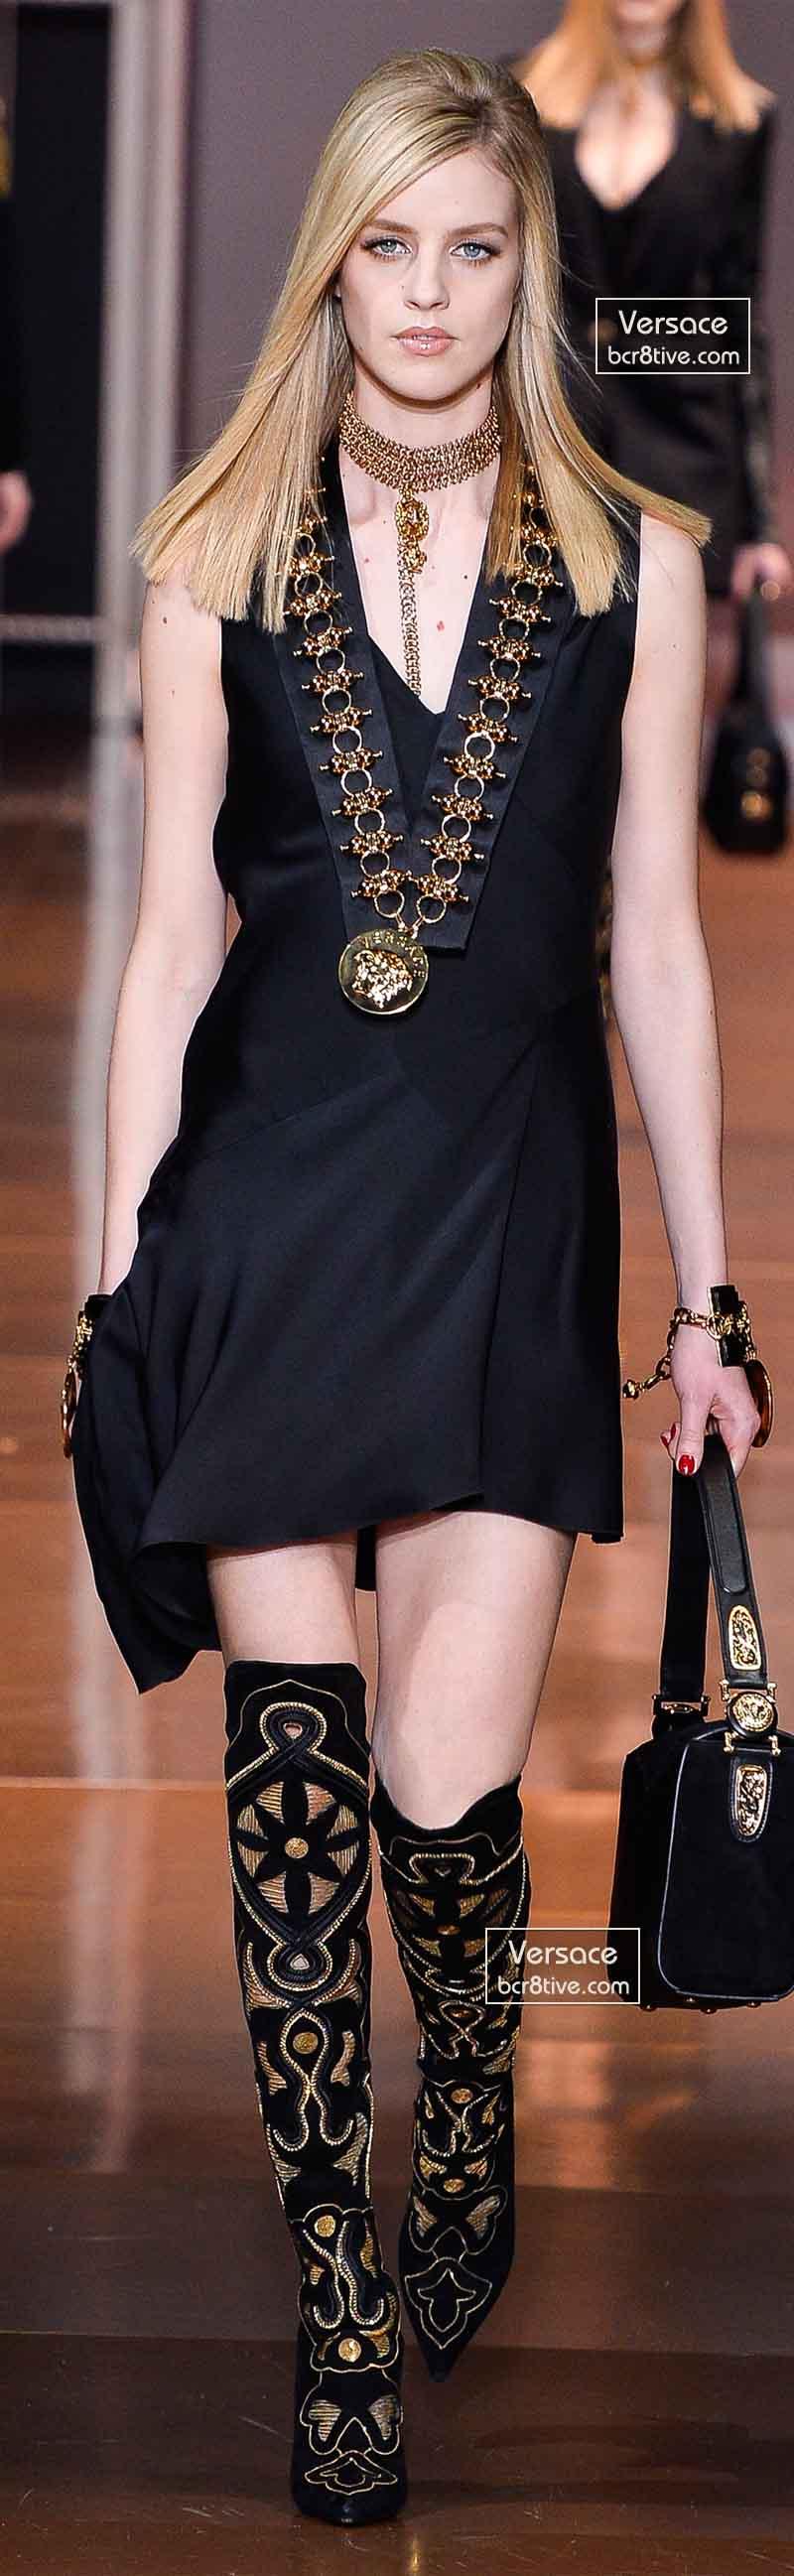 Versace Fall 2014 - Julia Frauche